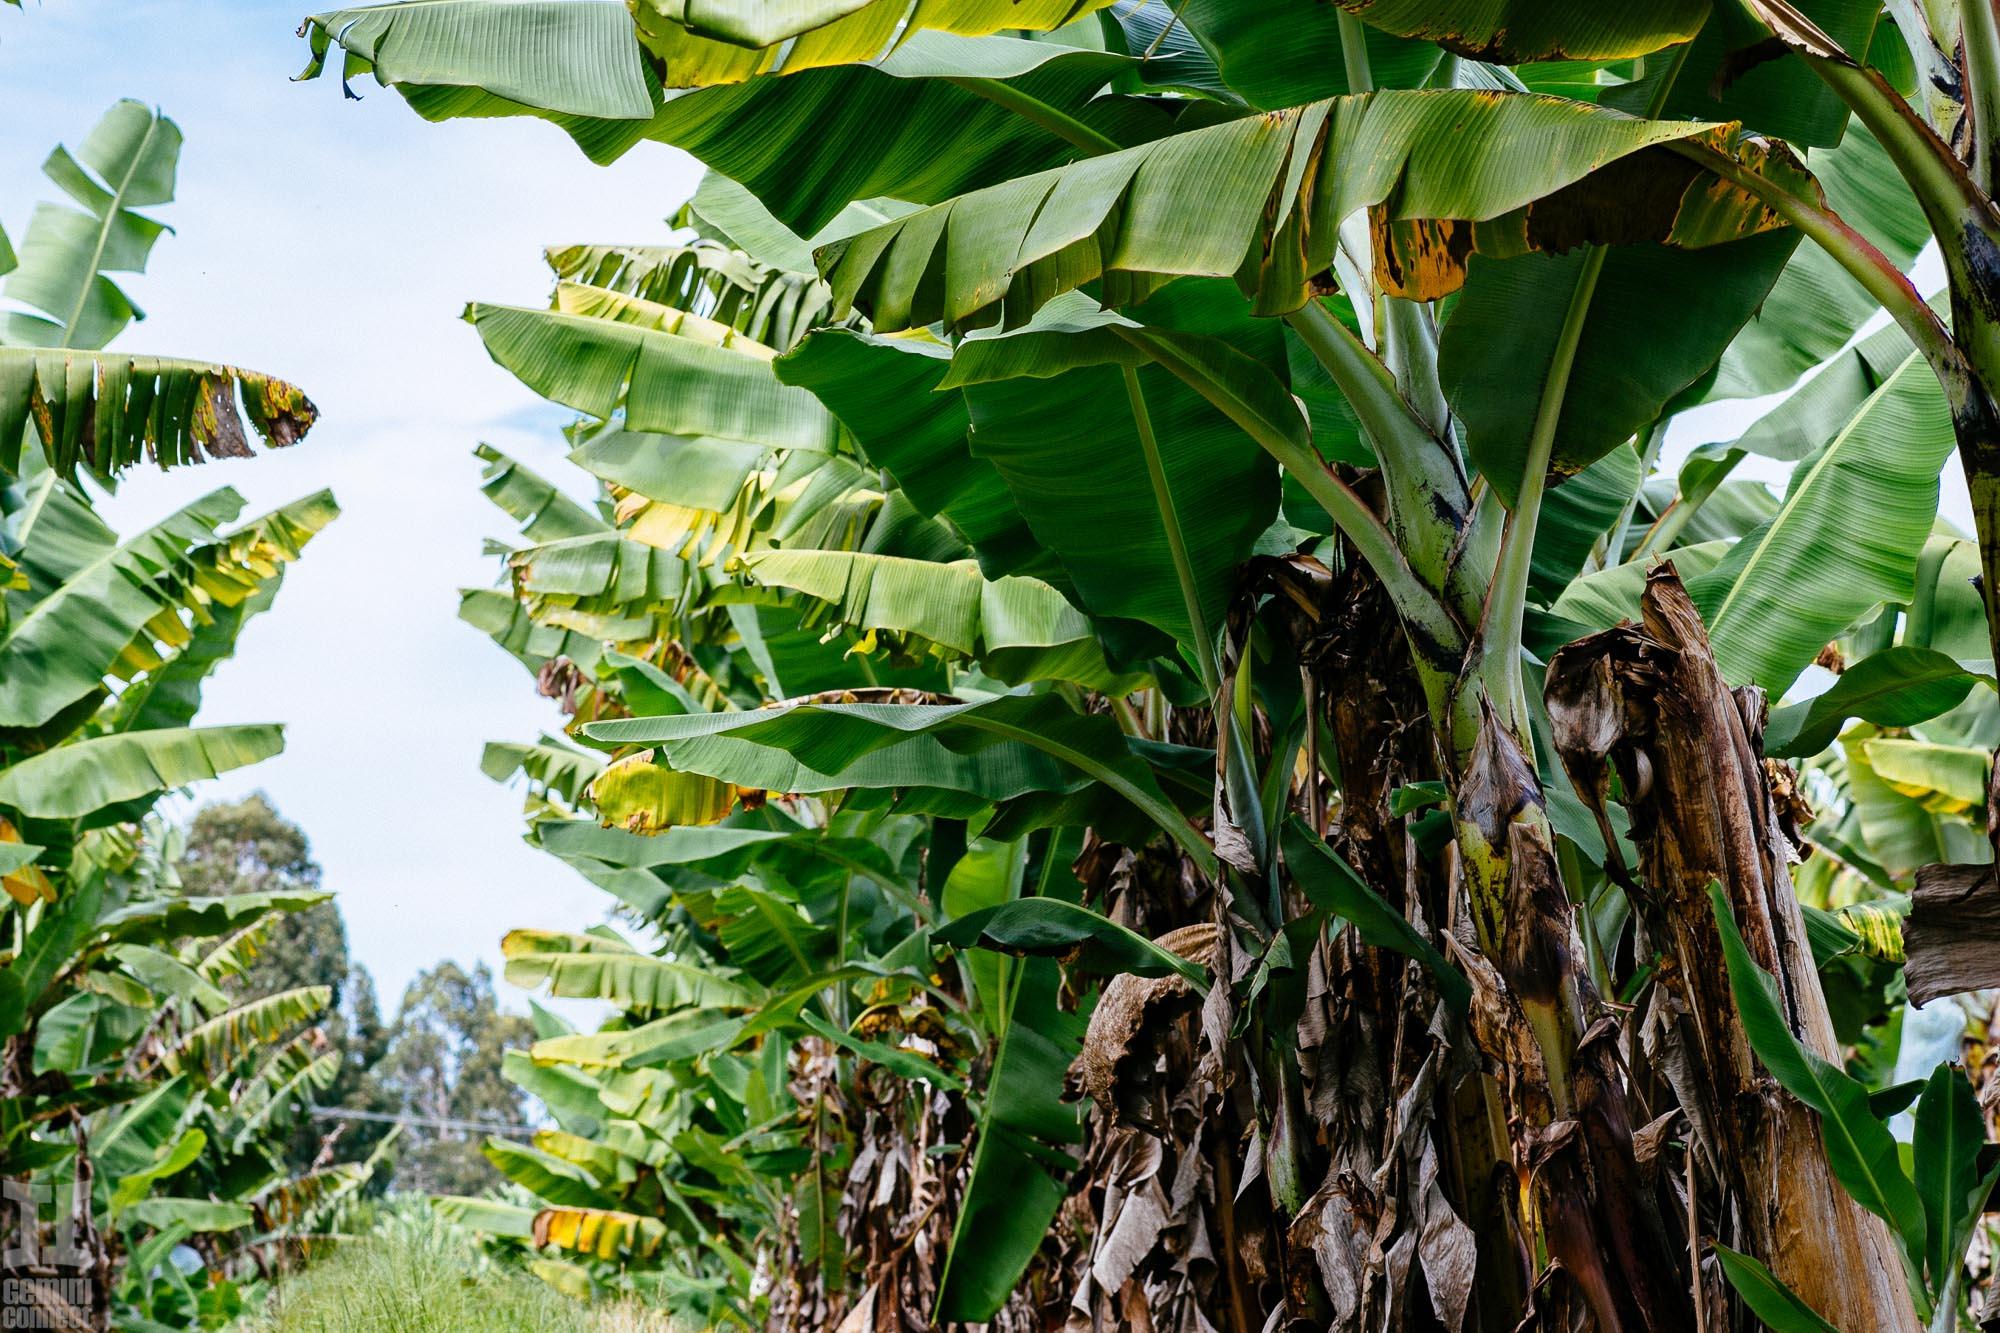 Hamakua-Bananas-9.jpg